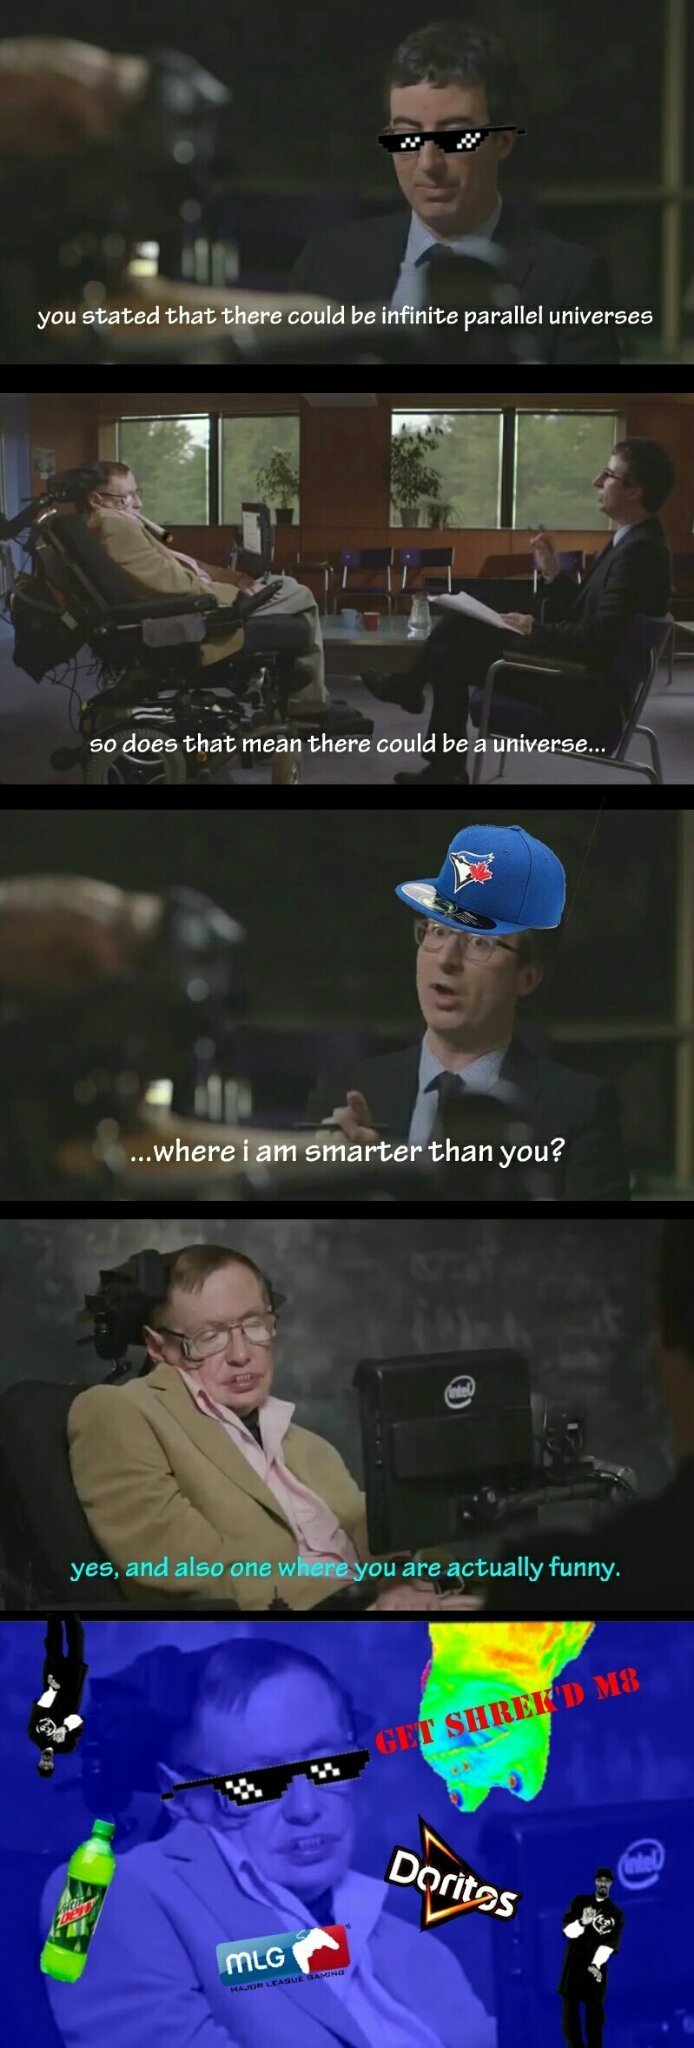 420blazeit - meme